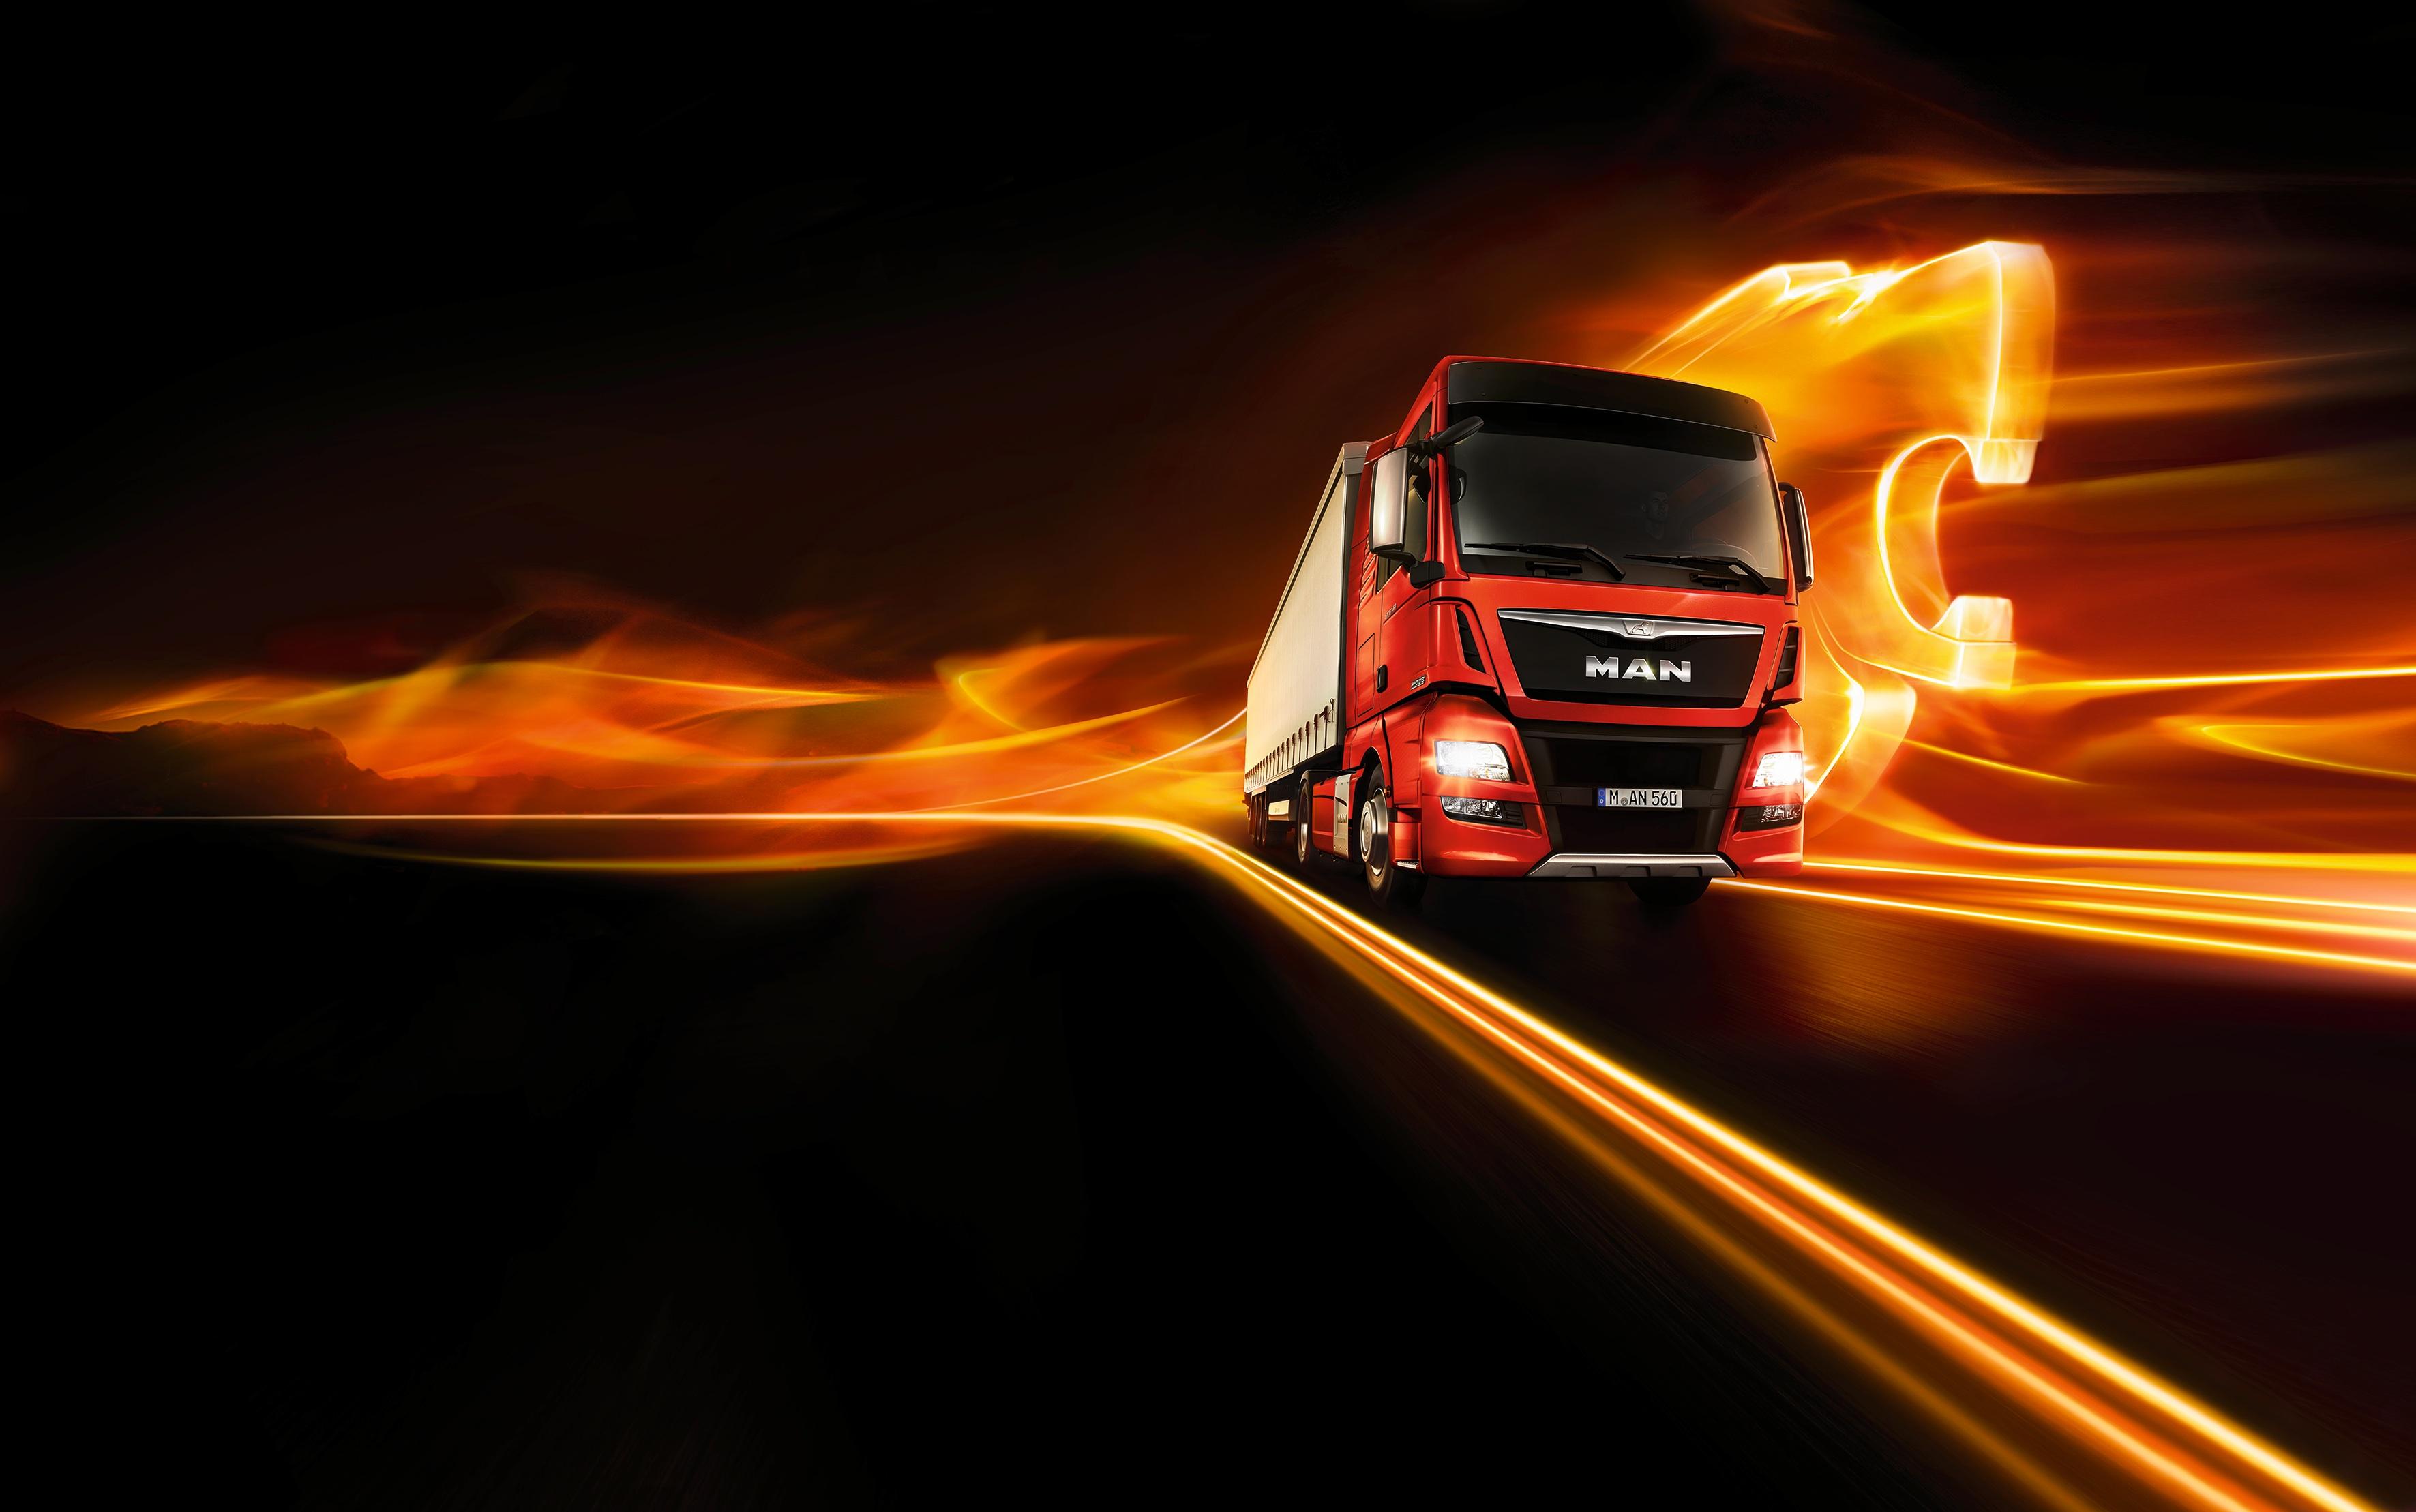 SEMI truck tractor trailer transport big rig transportation lorry vehicle wallpaper   3543x2218   1171637   WallpaperUP